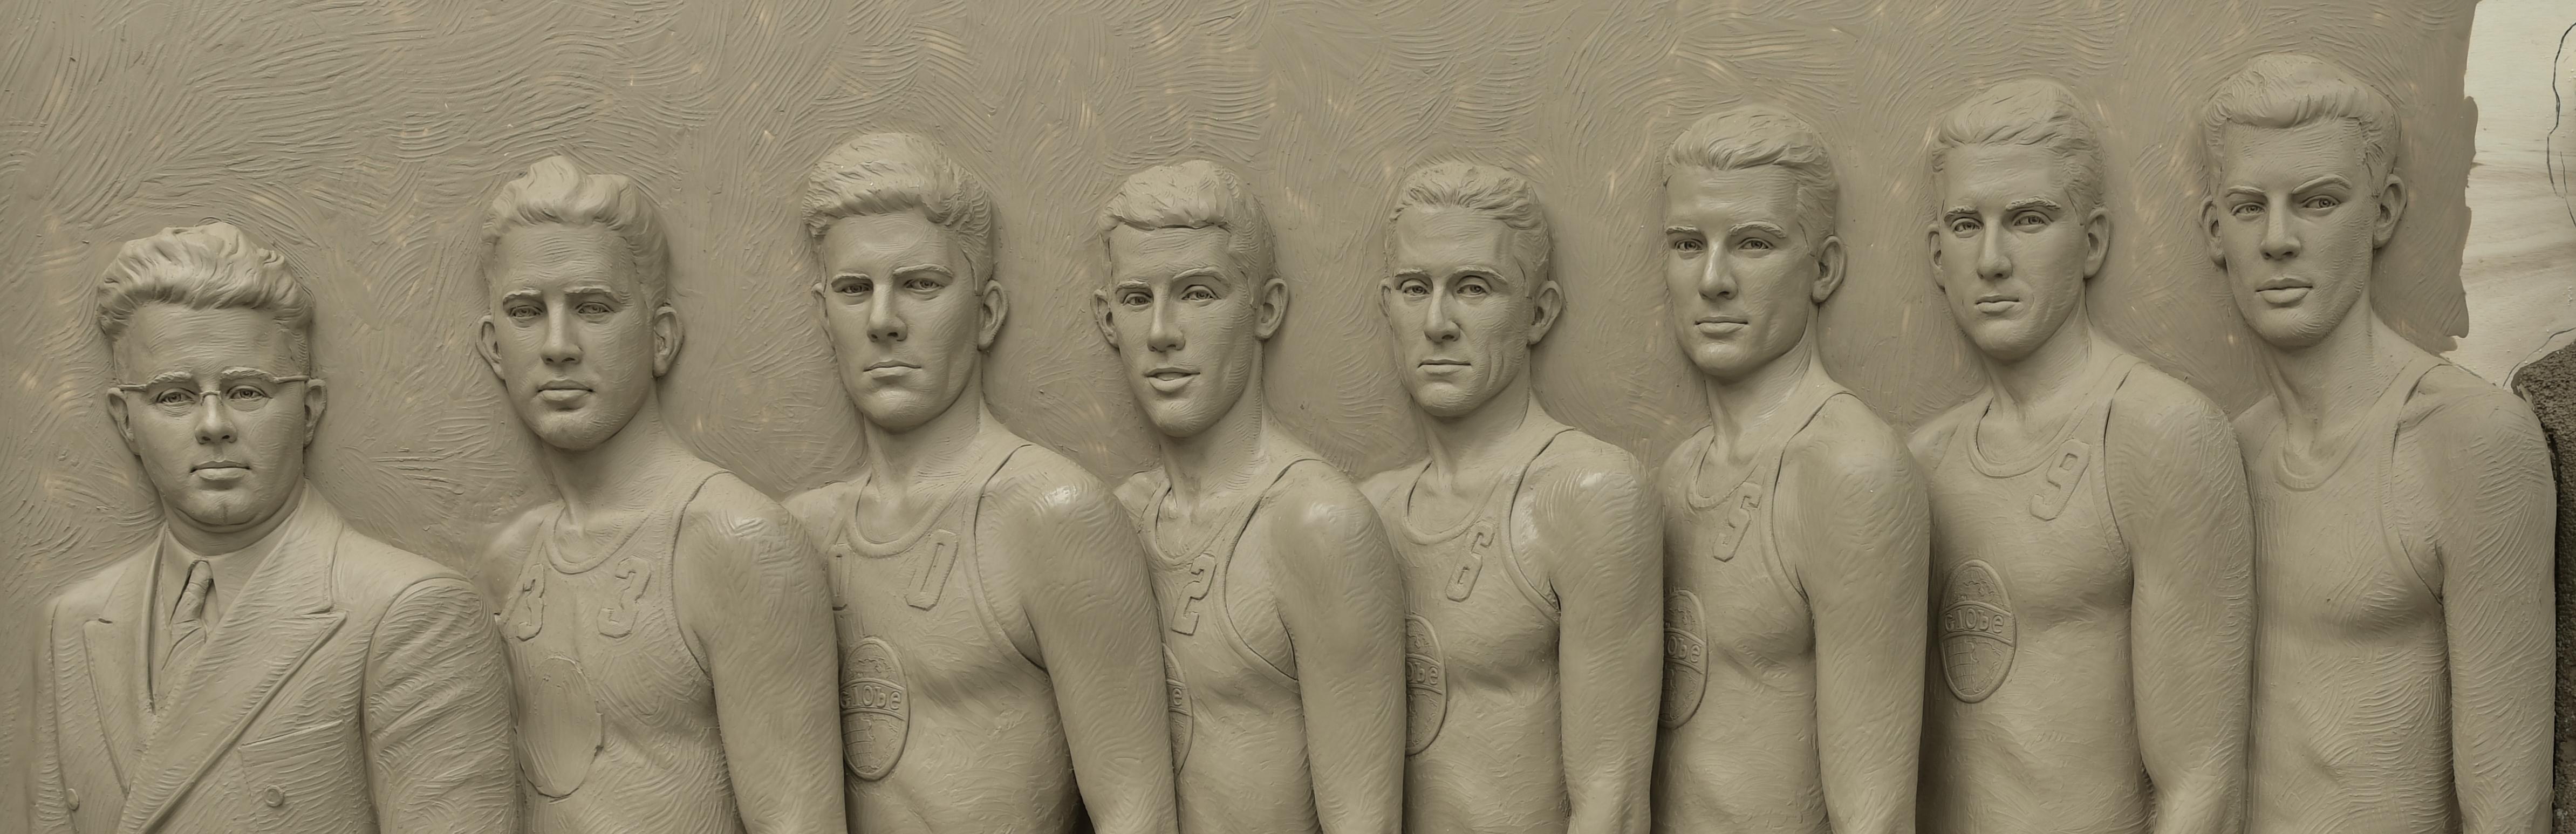 Kansas basketball monument, Kansas basketball sculpture, McPherson Globe Refiners, Gold medal basketball, 1936 Olympics, Sutton Betti Sculptures,